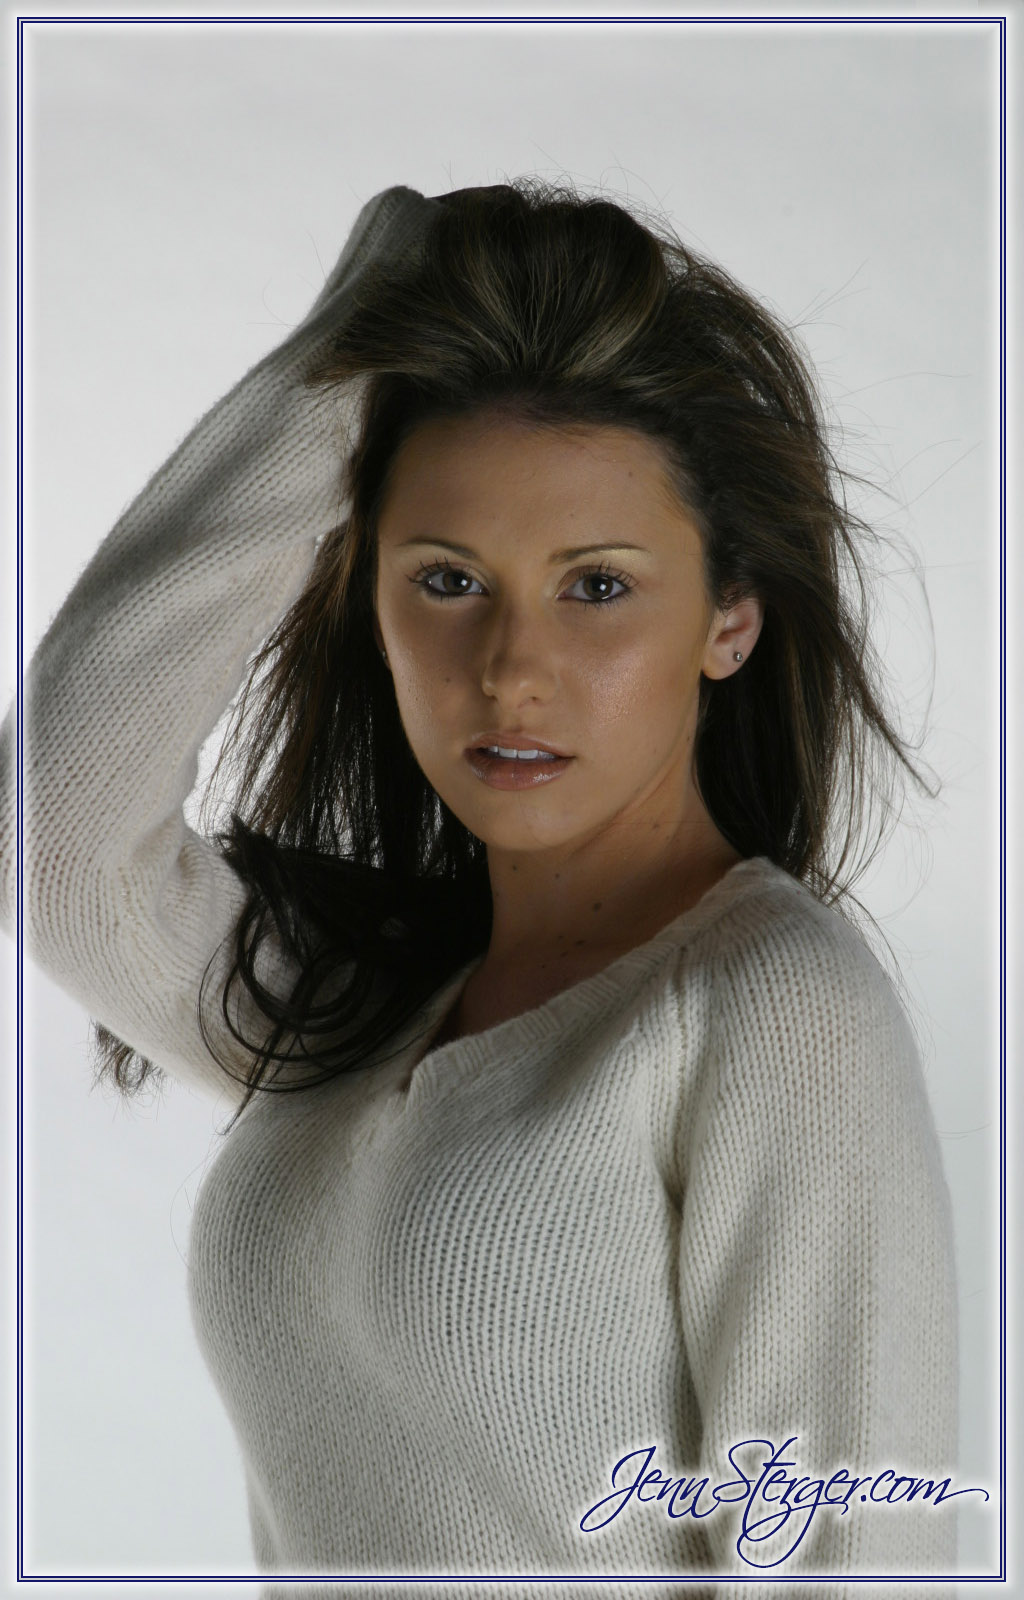 Jenn Sterger hot photo